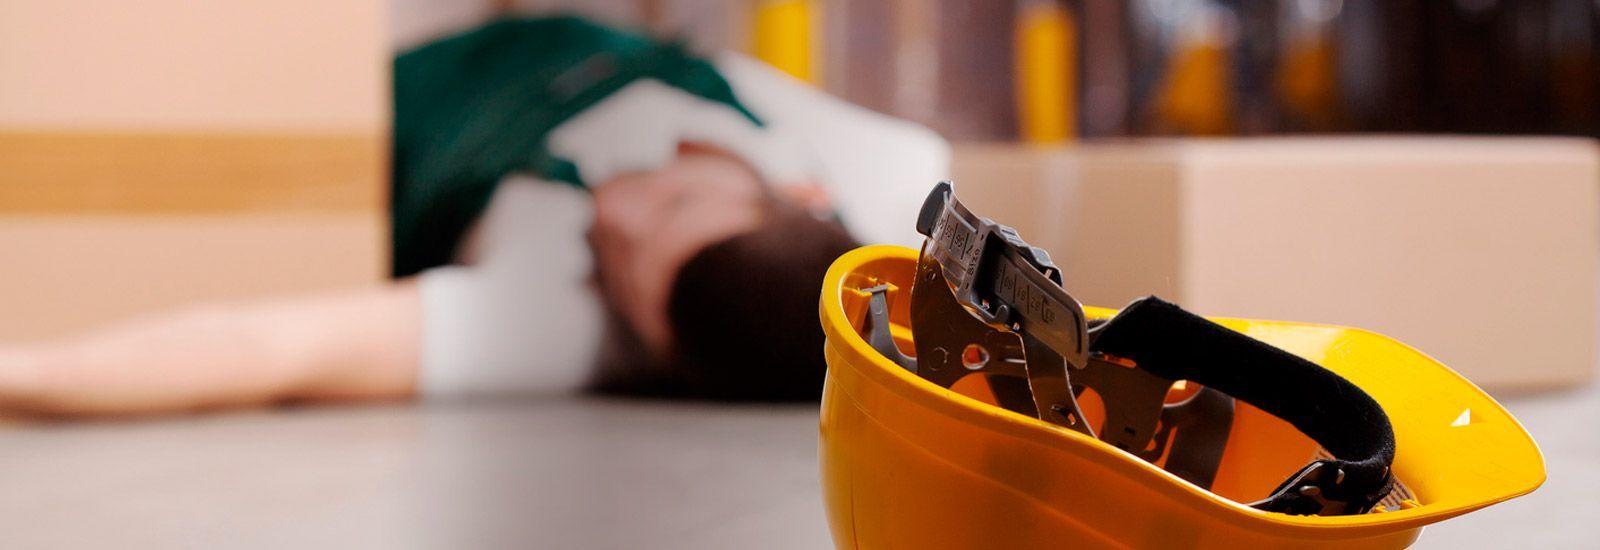 Accidentes Laborales – Laboralium Abogados Laboralistas